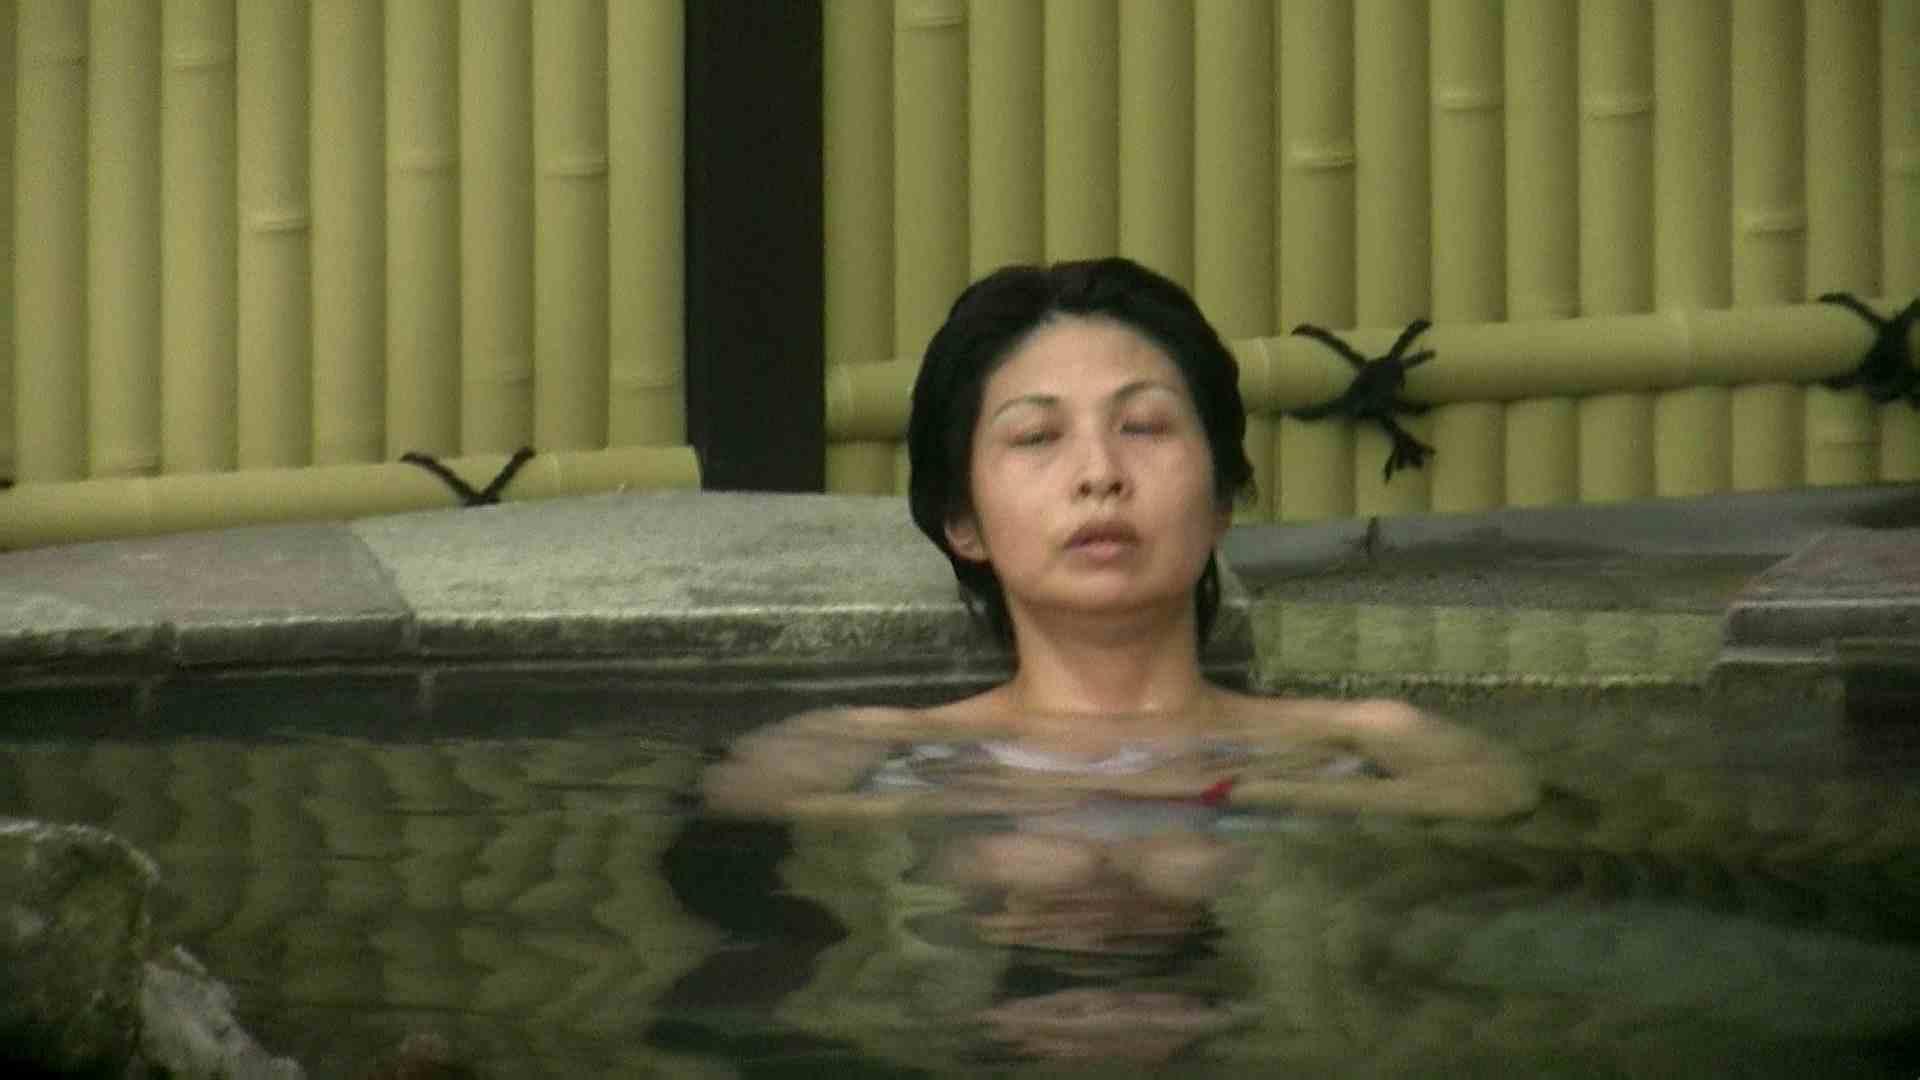 Aquaな露天風呂Vol.636 OL女体 | 露天  87連発 22